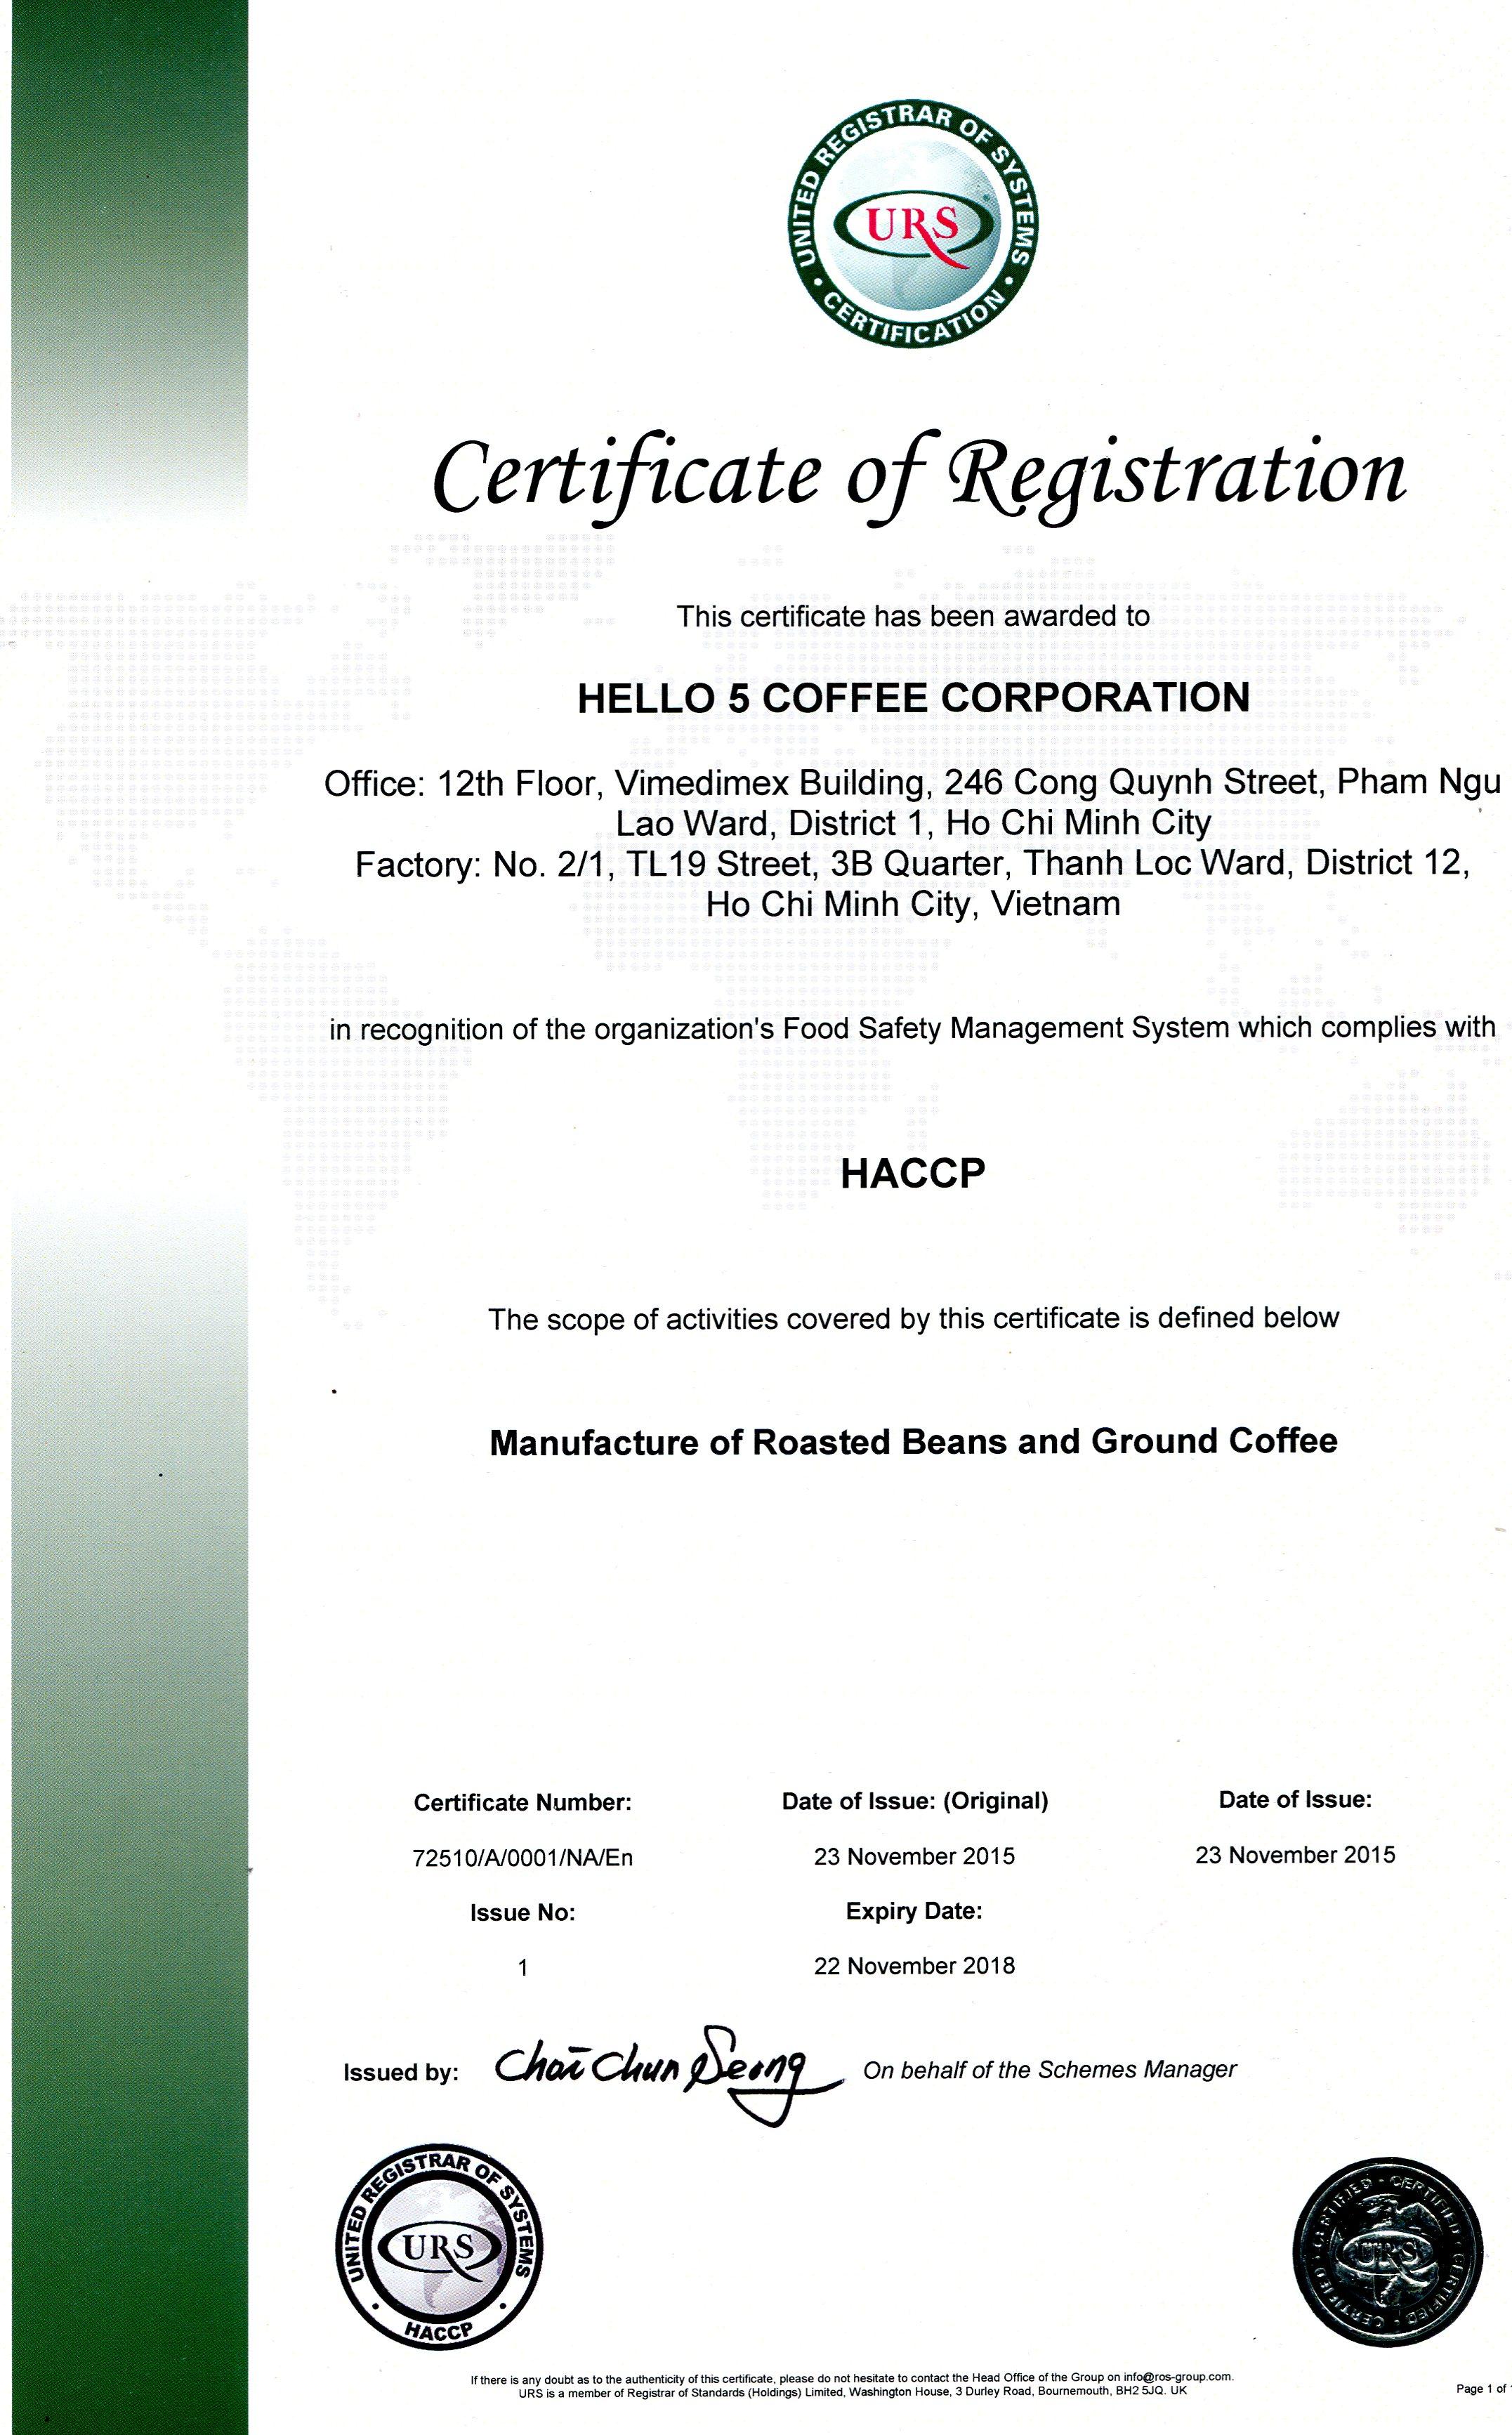 haccp-hello-5-coffee